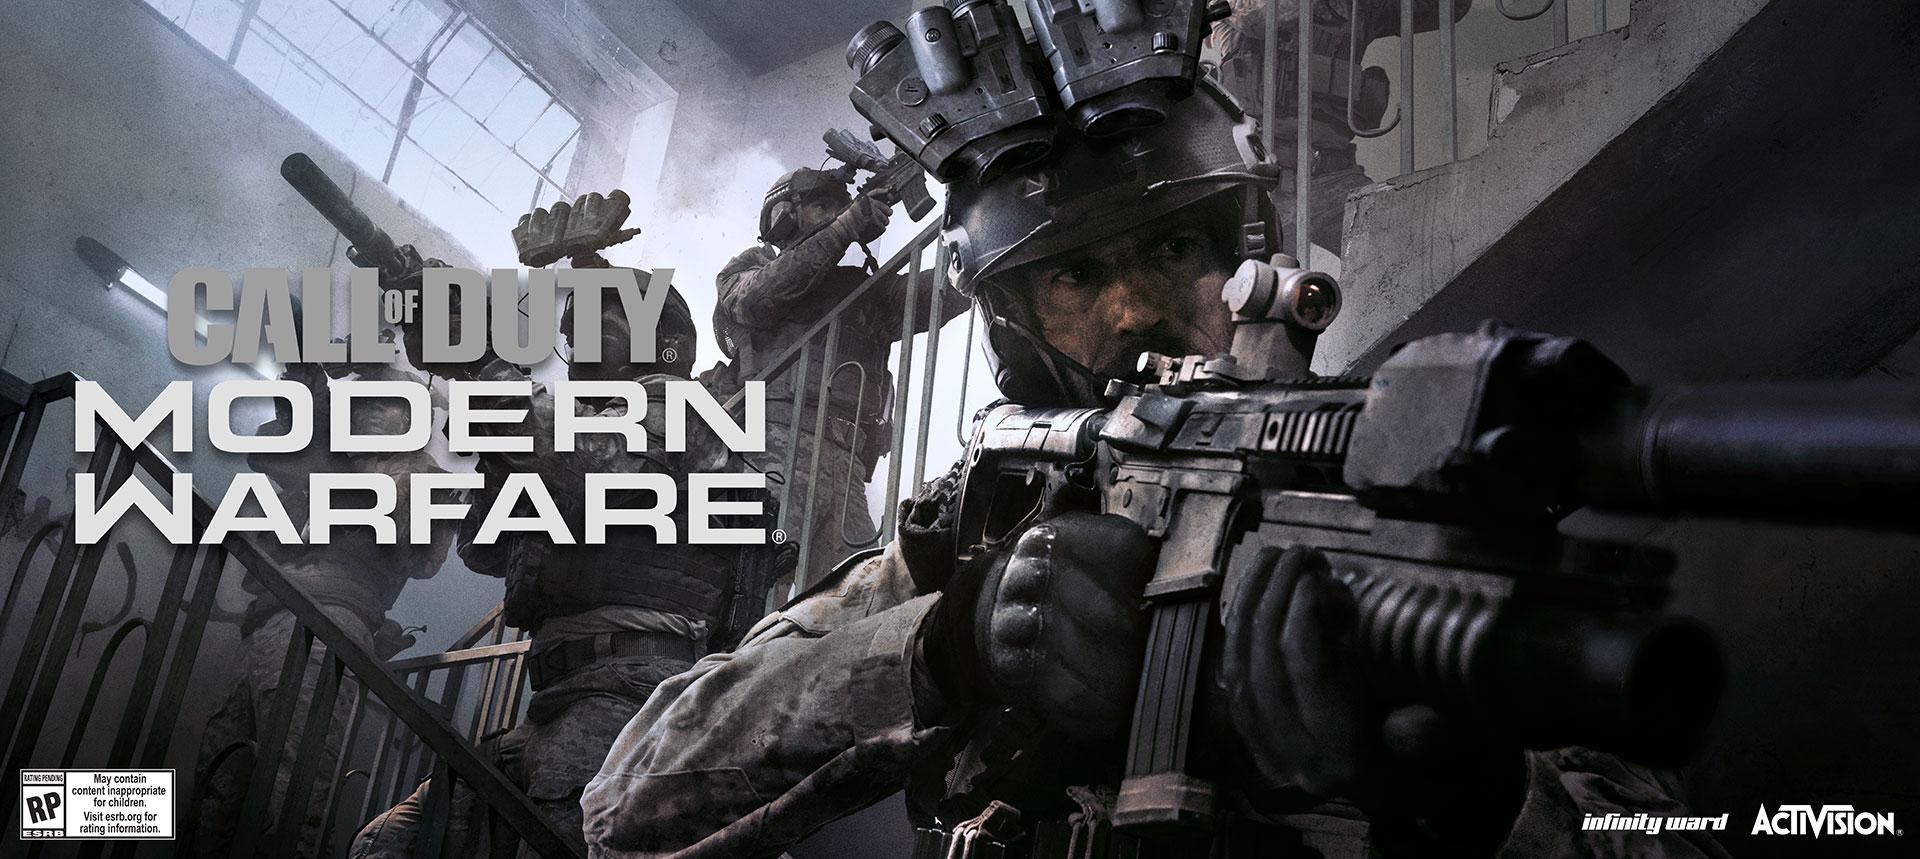 Call of Duty: Modern Warfare - Multiplayer Reveal - GameSpace com